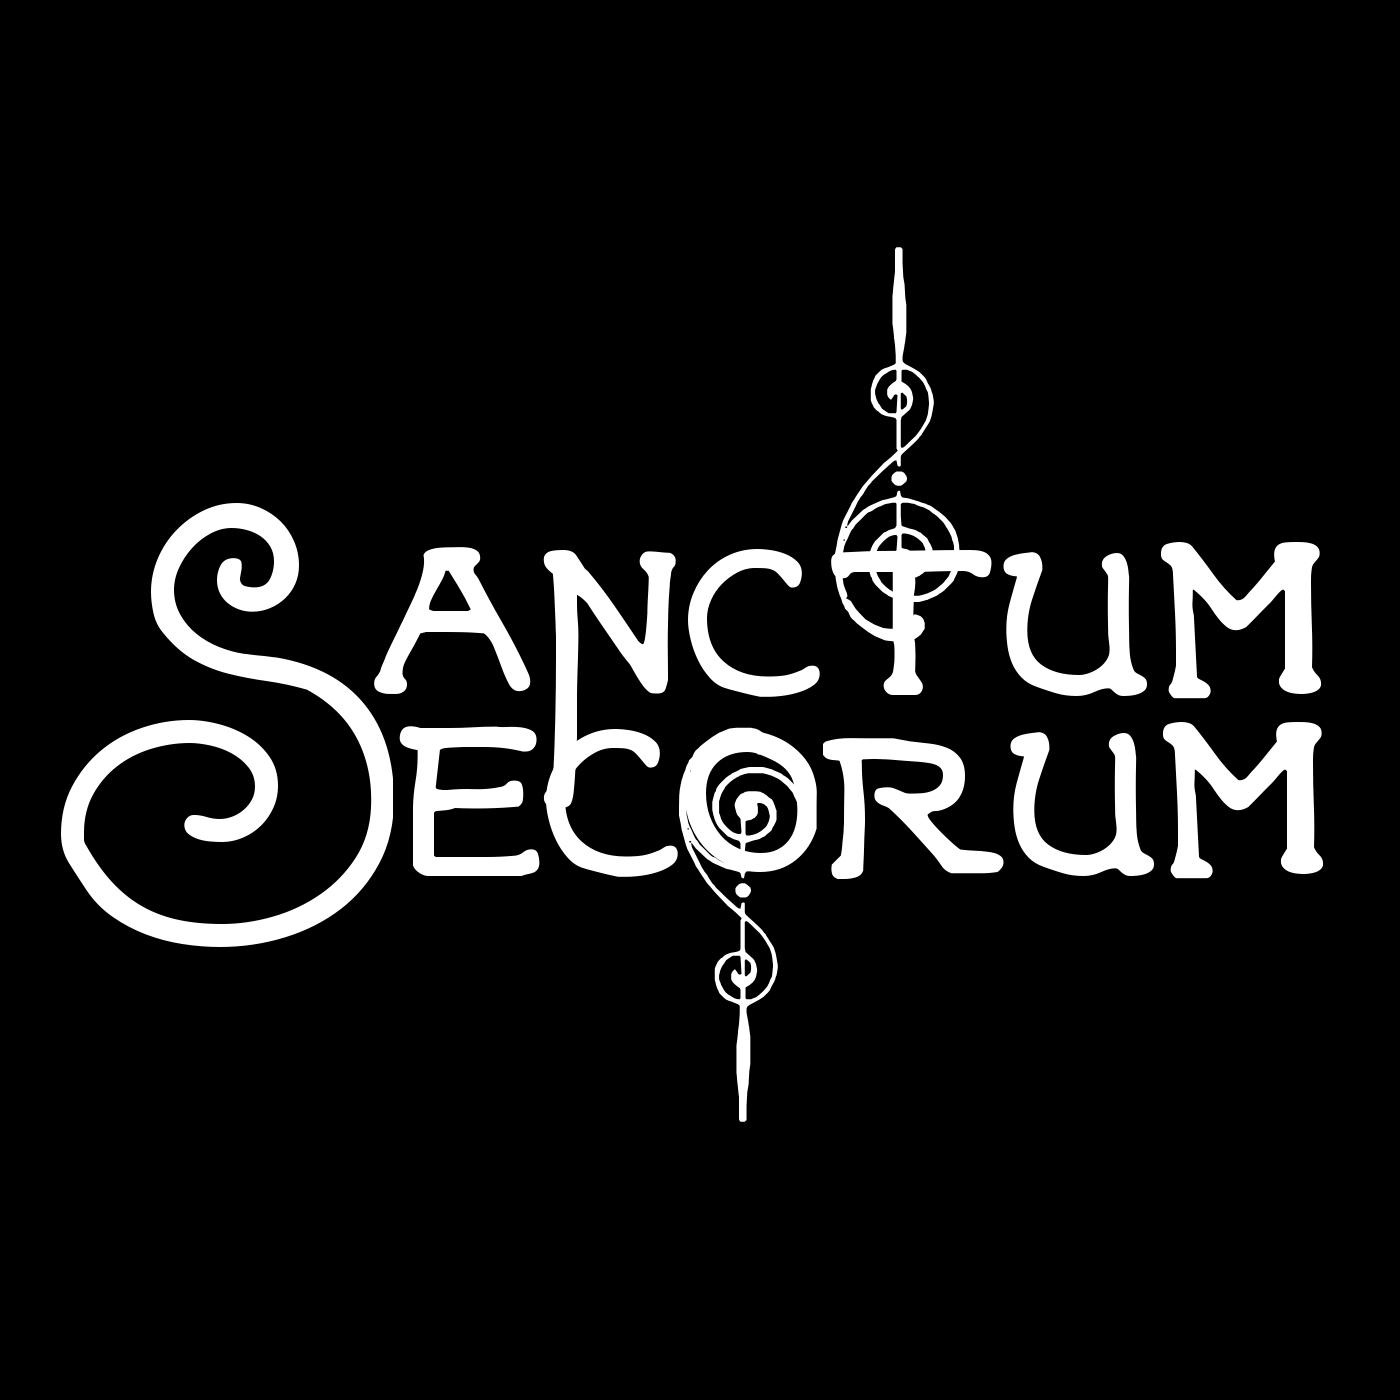 Sanctum Secorum #10 - The Maker of Gargoyles